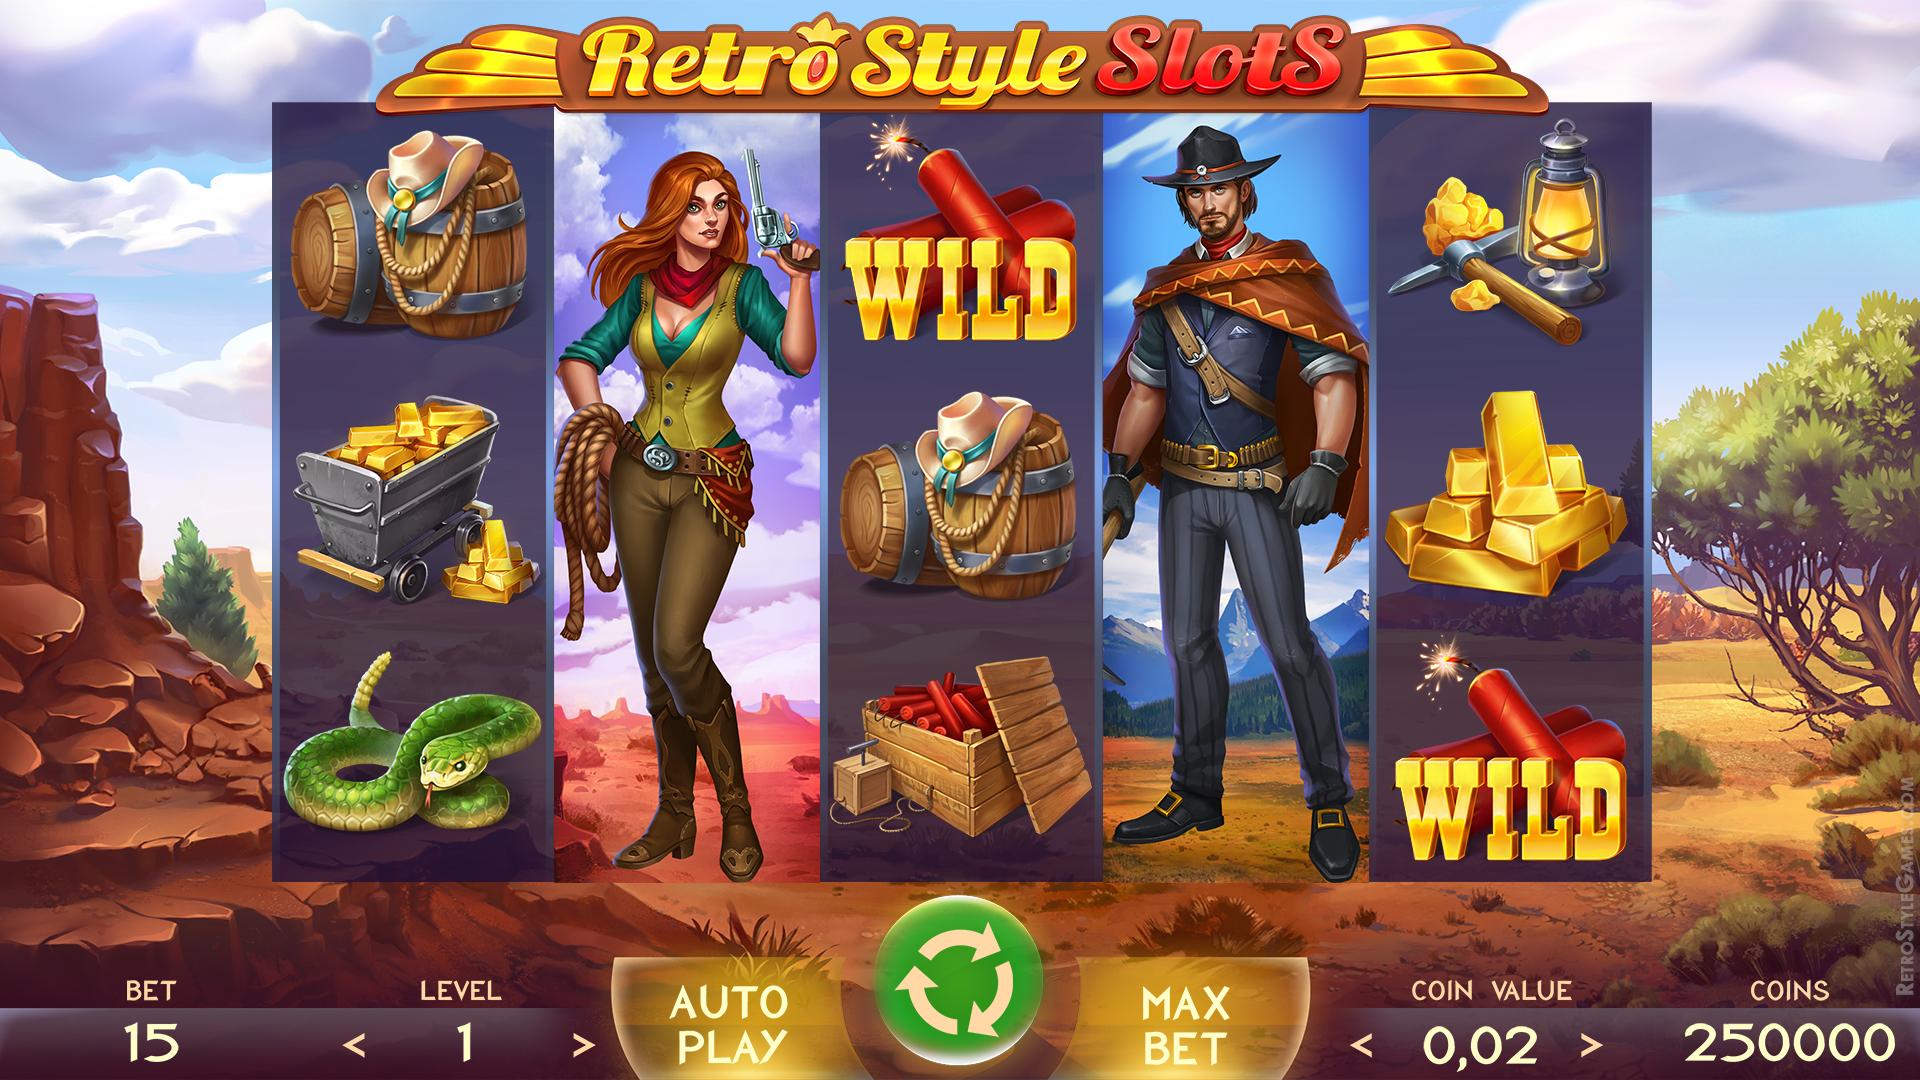 west, slot, icons, assets, casino,jackpot,gambling,roulette,slots,poker,las vegas,slot machine photos,slot machine videos